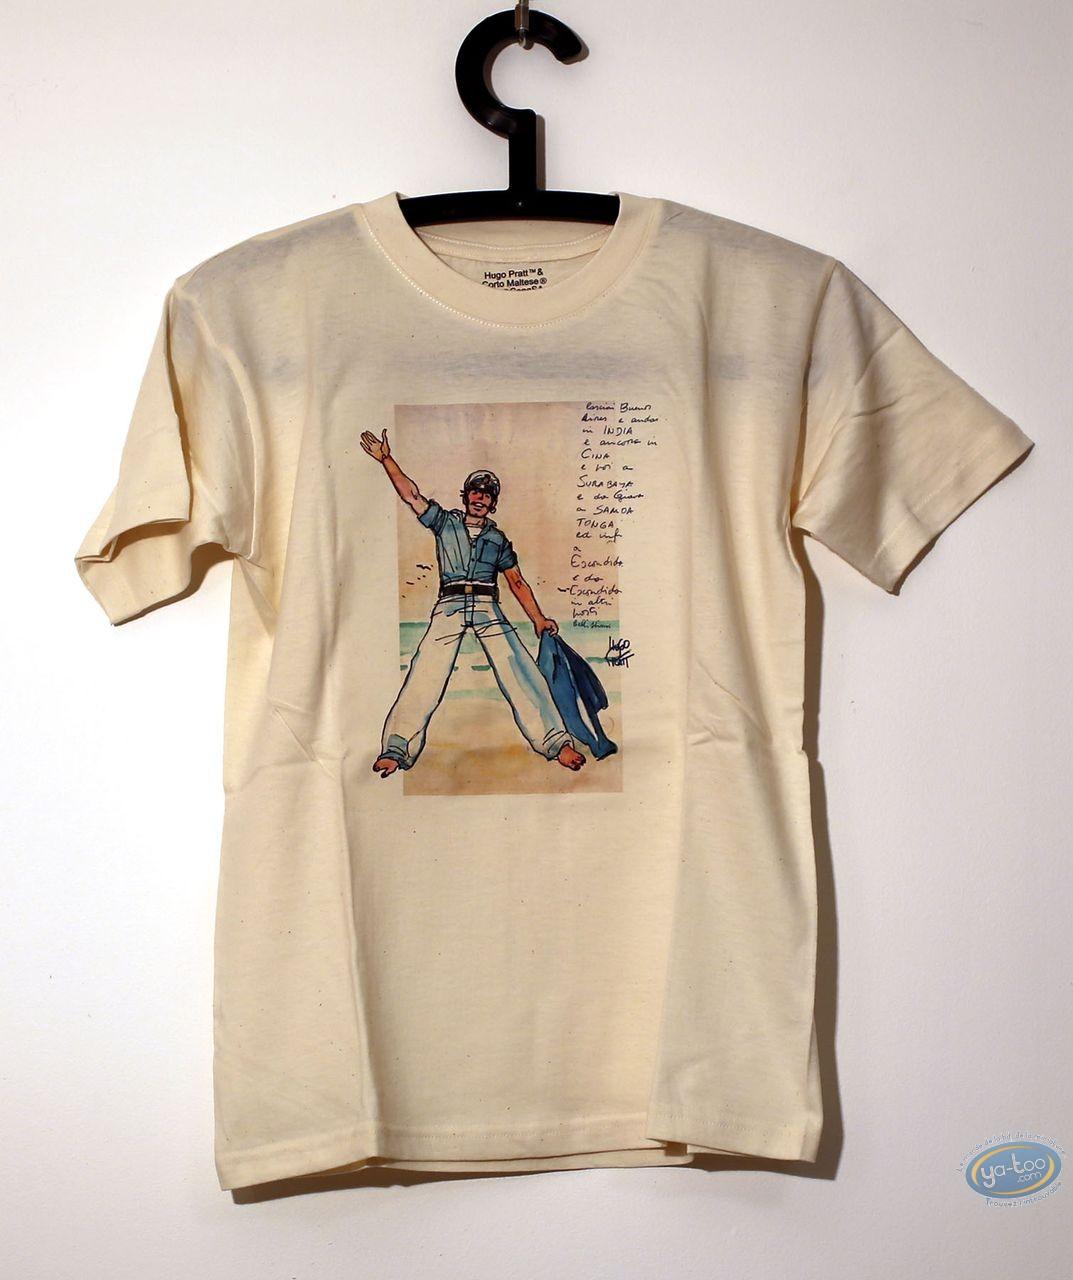 Clothes, Corto Maltese : T-shirt, Corto Maltese : Kid 08/02 - 9/11 years